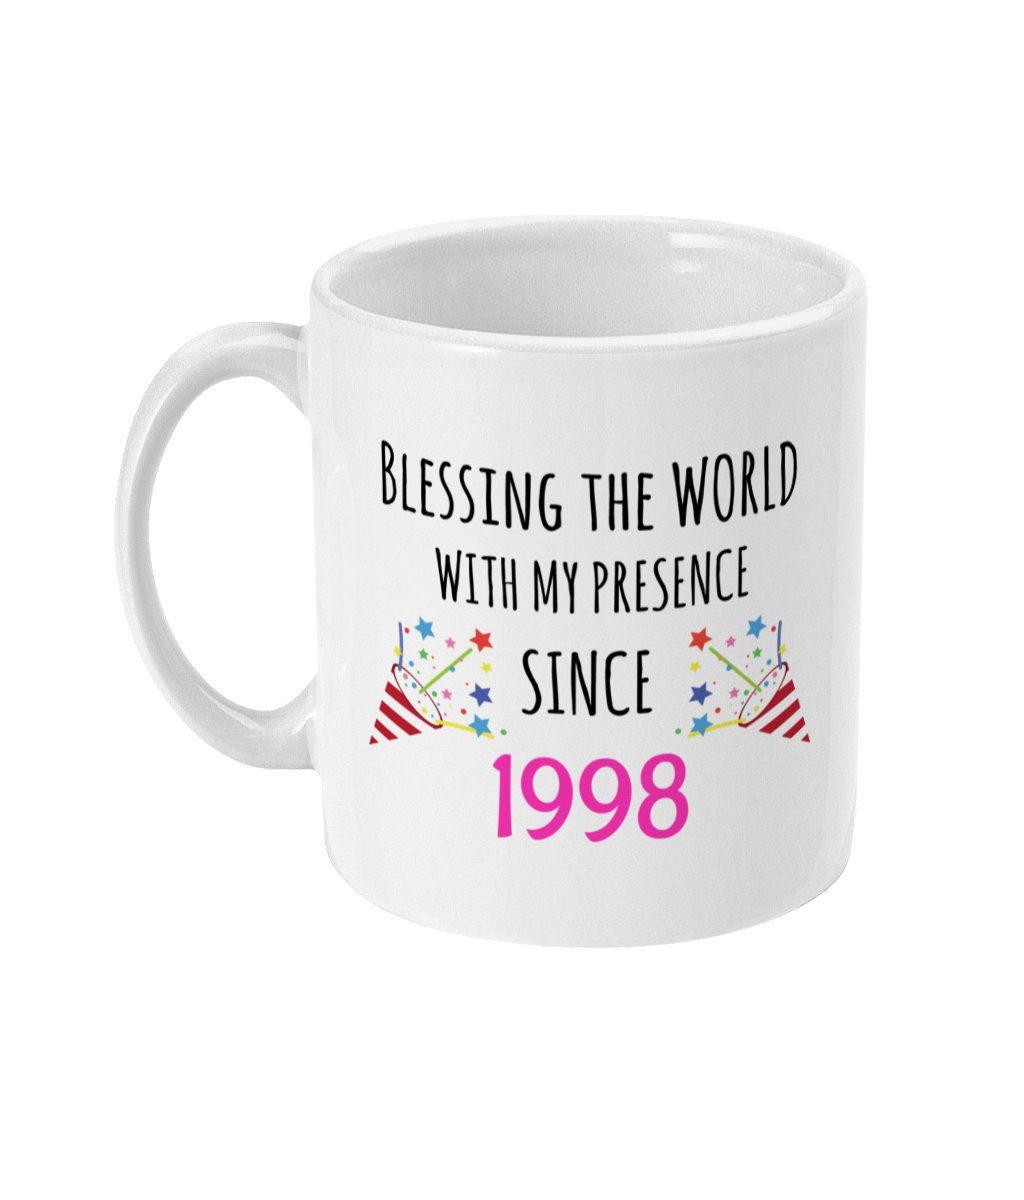 21st birthday gift 21st birthday mug born in 1998 gifts